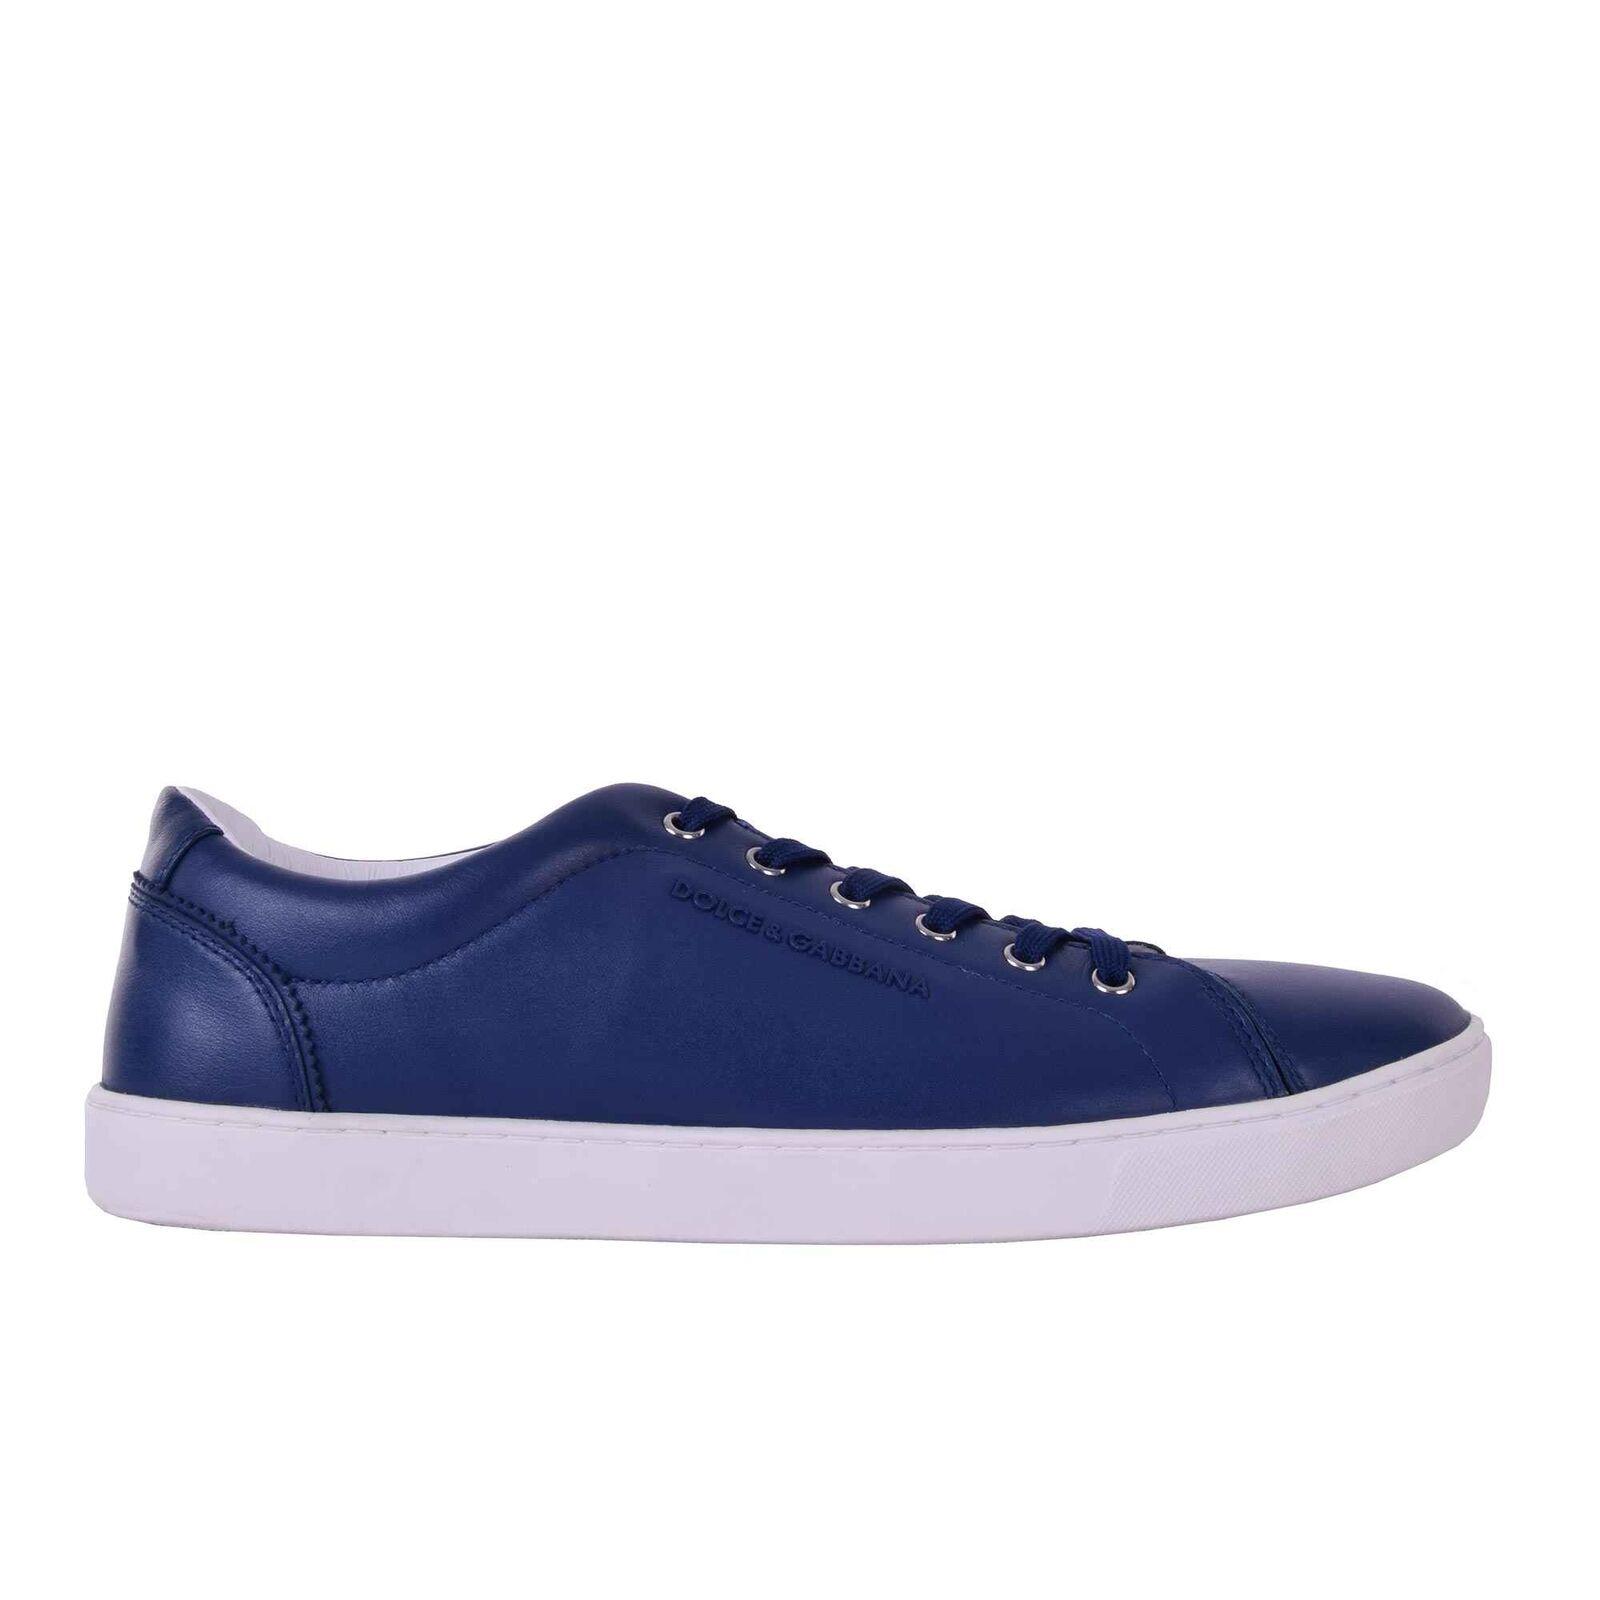 DOLCE & GABBANA Klassische Leder Sneakers Logo Zapatos NEW RU mit Logo Sneakers Blau 05933 6f703d